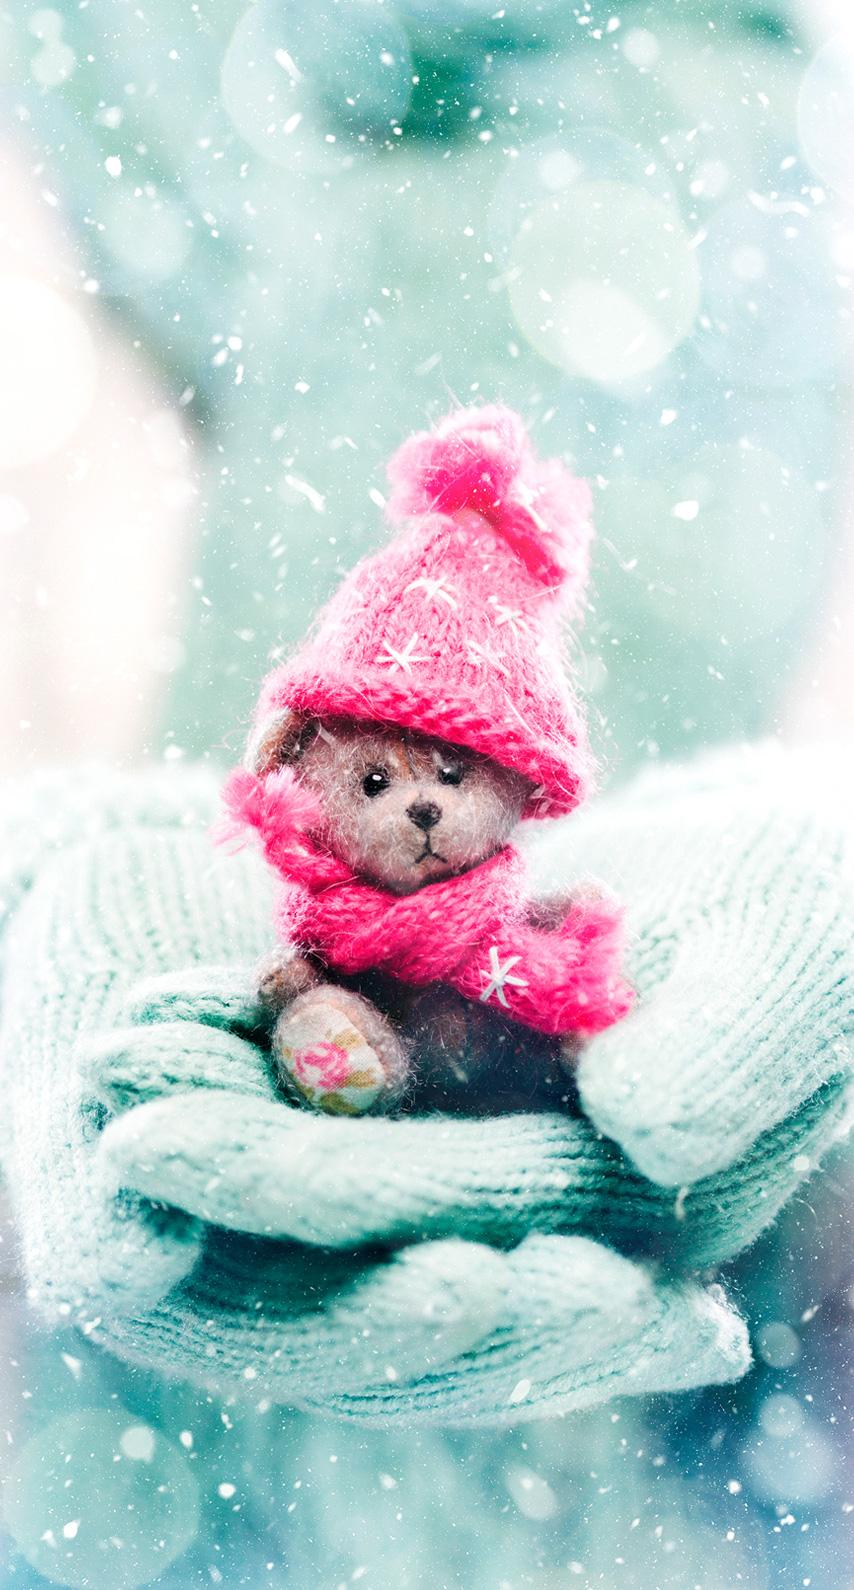 snow, snowflake